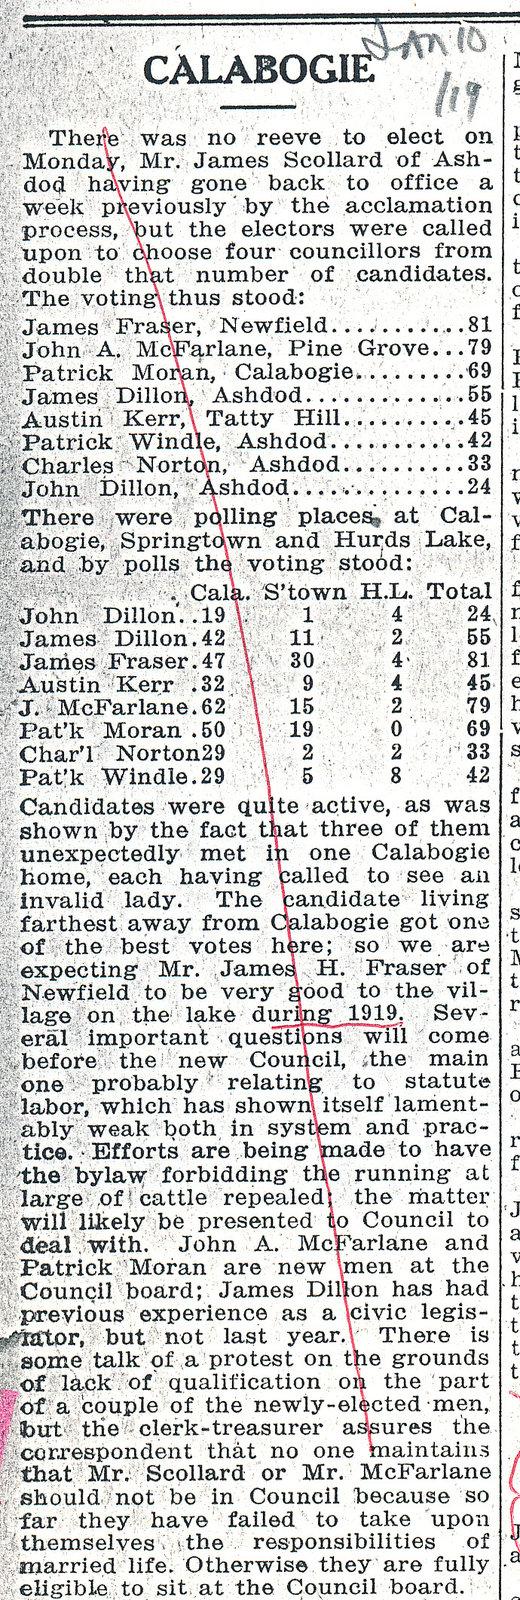 Calabogie News - Jan. 10, 1919